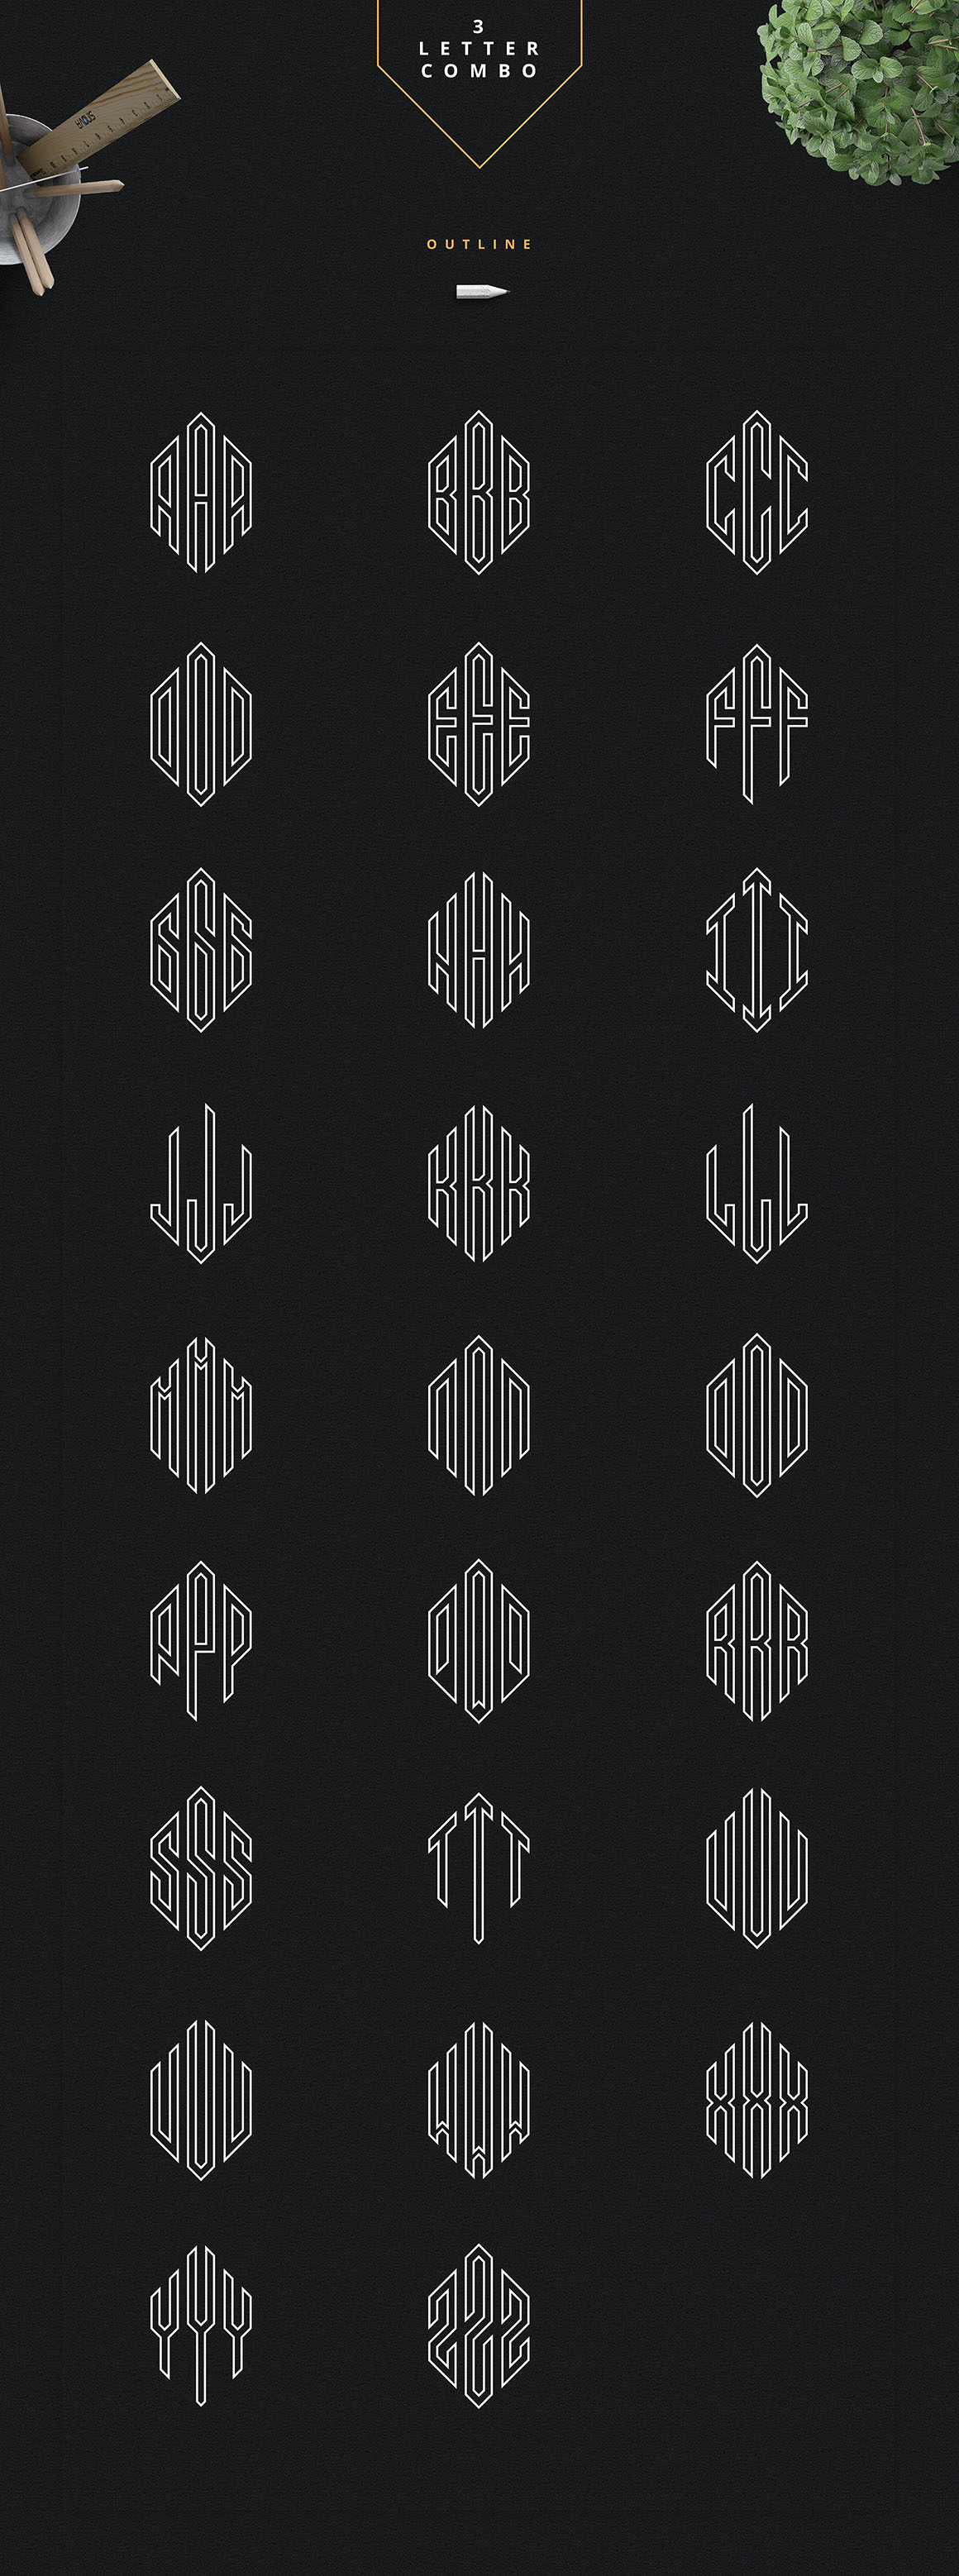 6in1-Ultimate-Monogram-creator-09.jpg